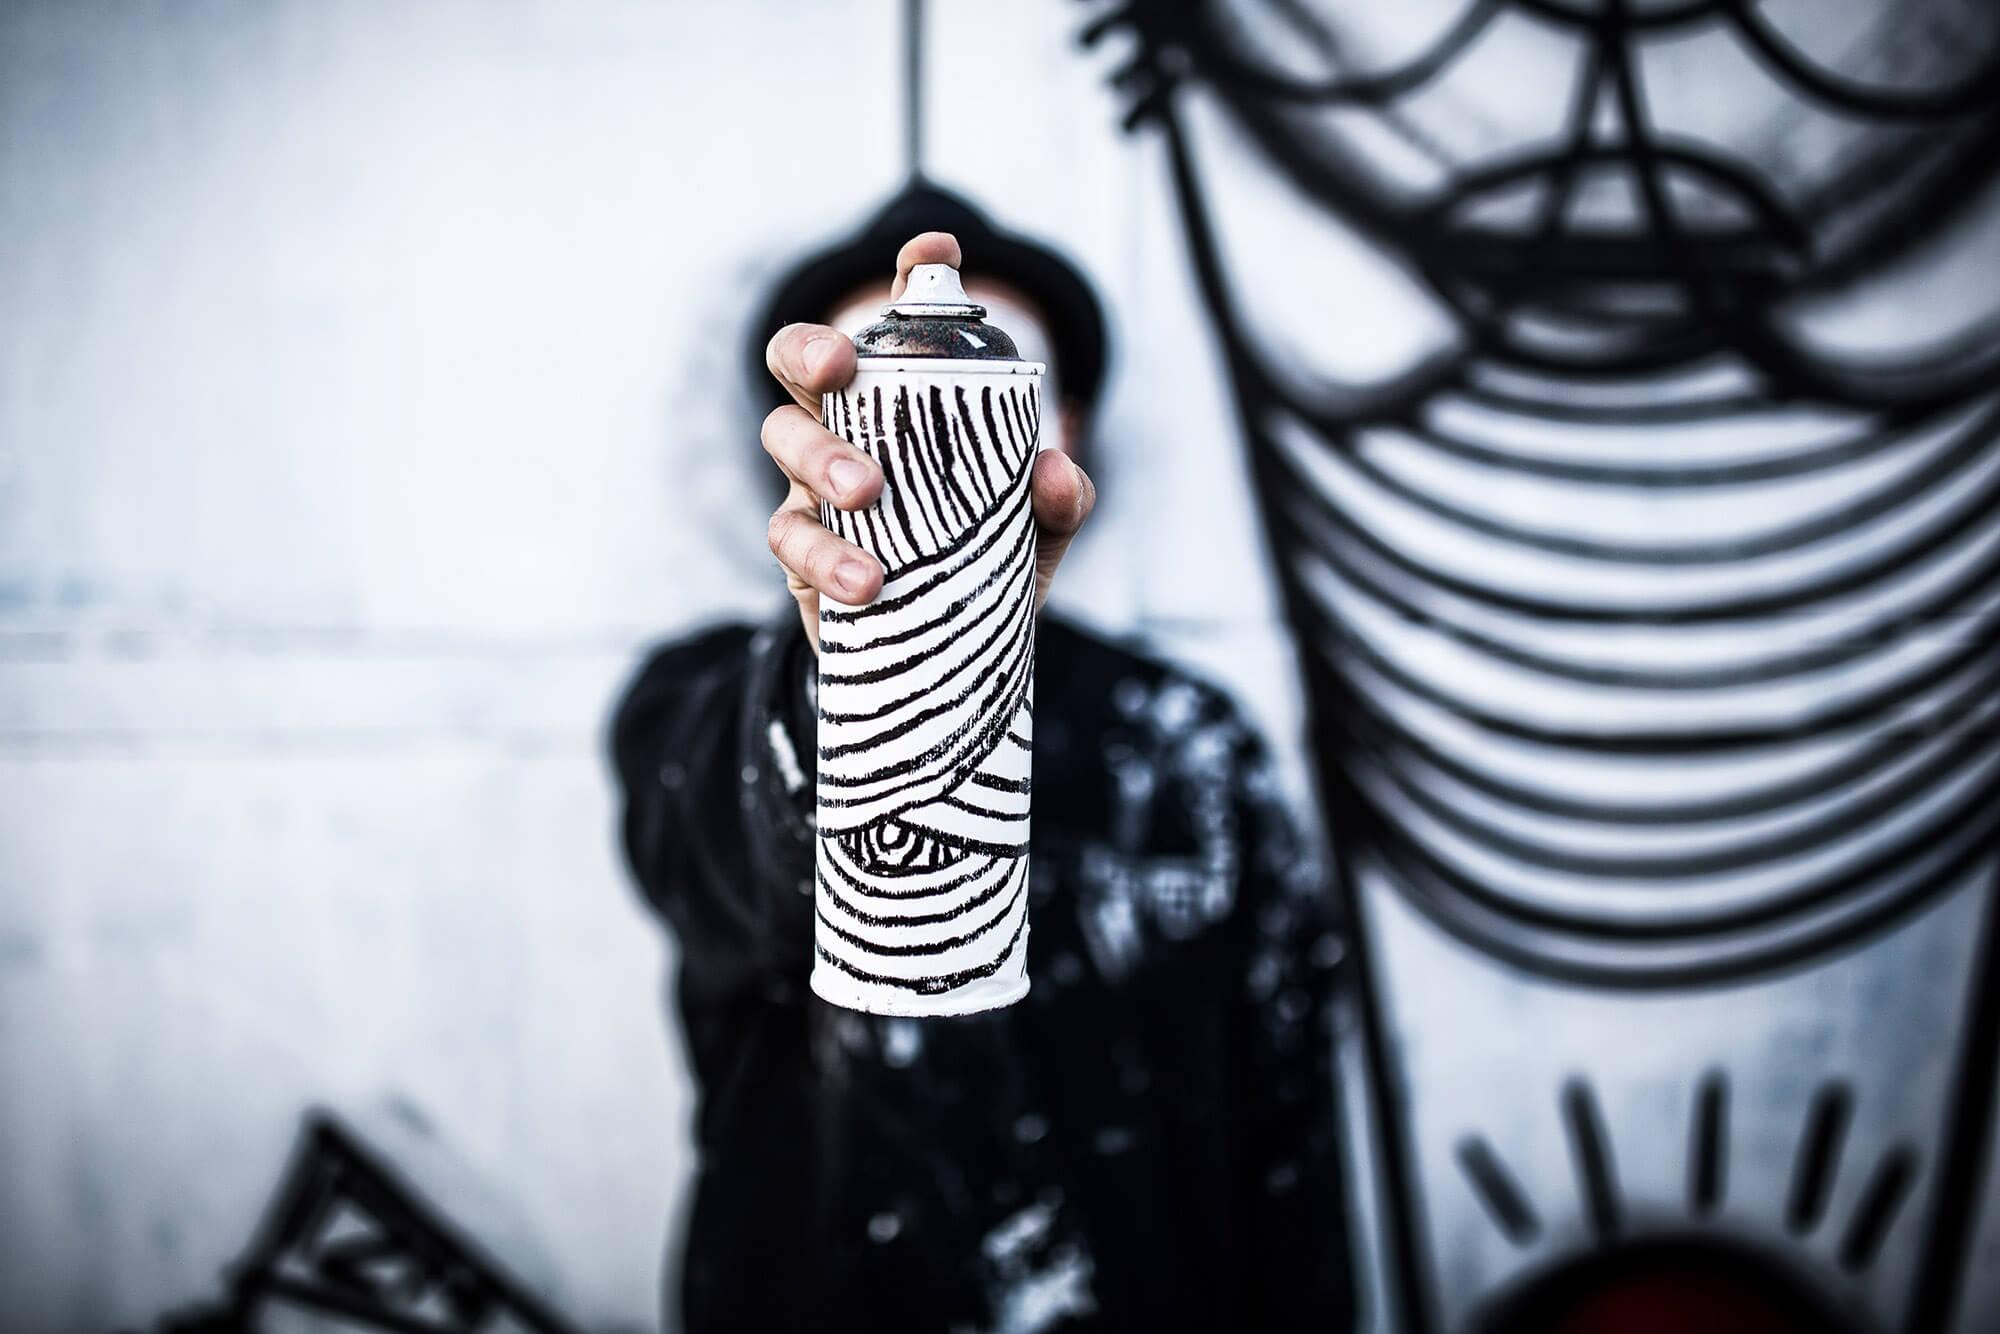 mamut izm artist streetart flap photography fotograf philipp greindl photographer linz austria